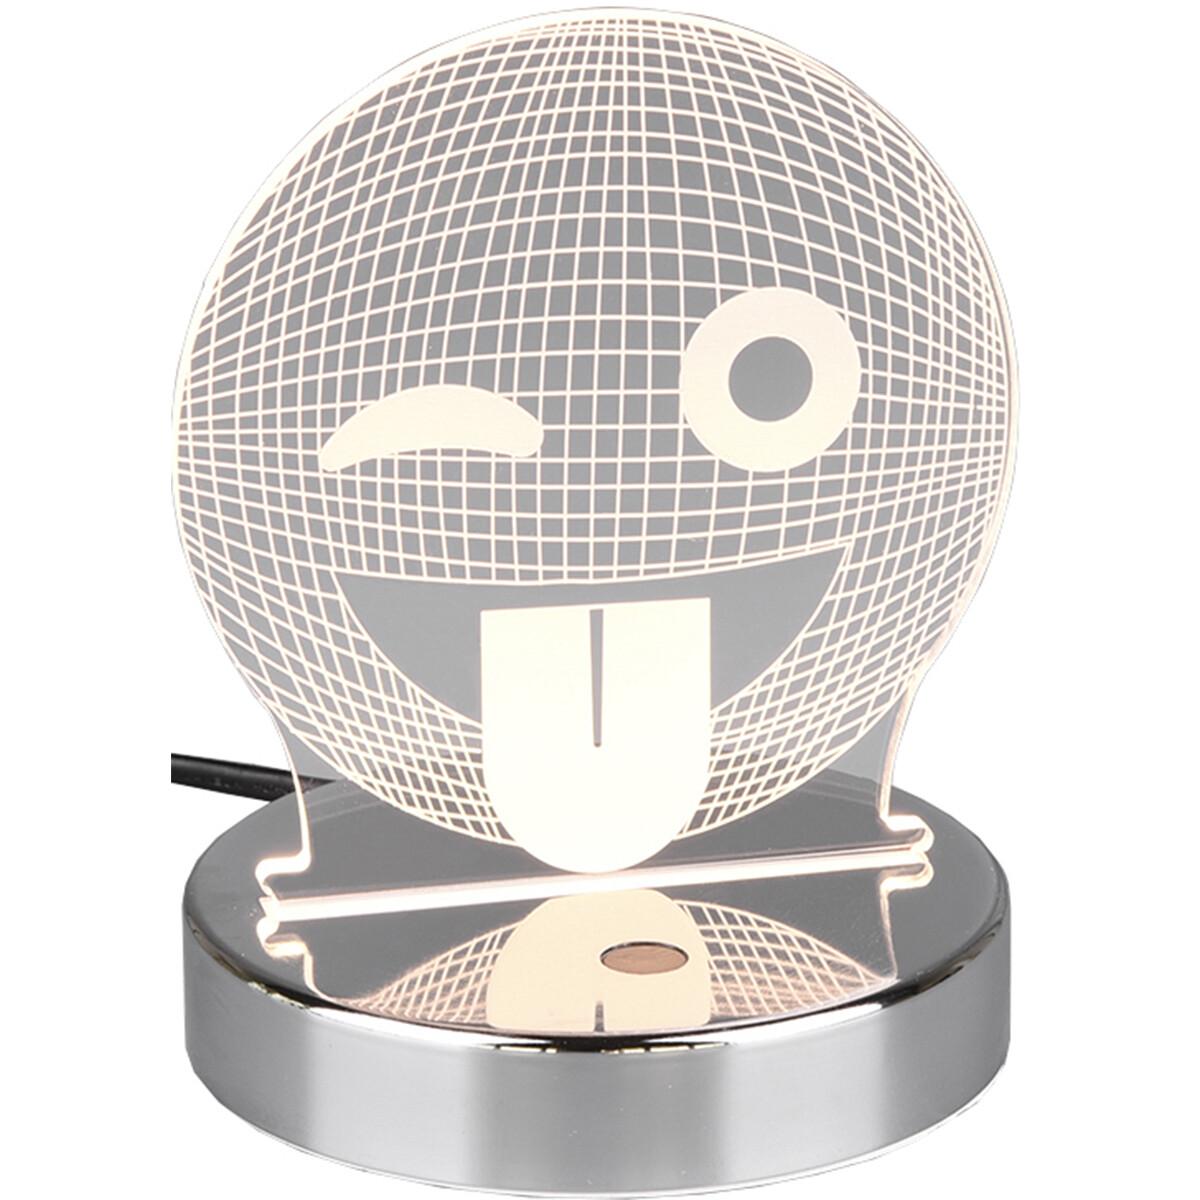 LED Tafellamp - Tafelverlichting - Trion Smilo - 3W - Warm Wit 3000K - RGBW - Rond - Mat Chroom - Aluminium